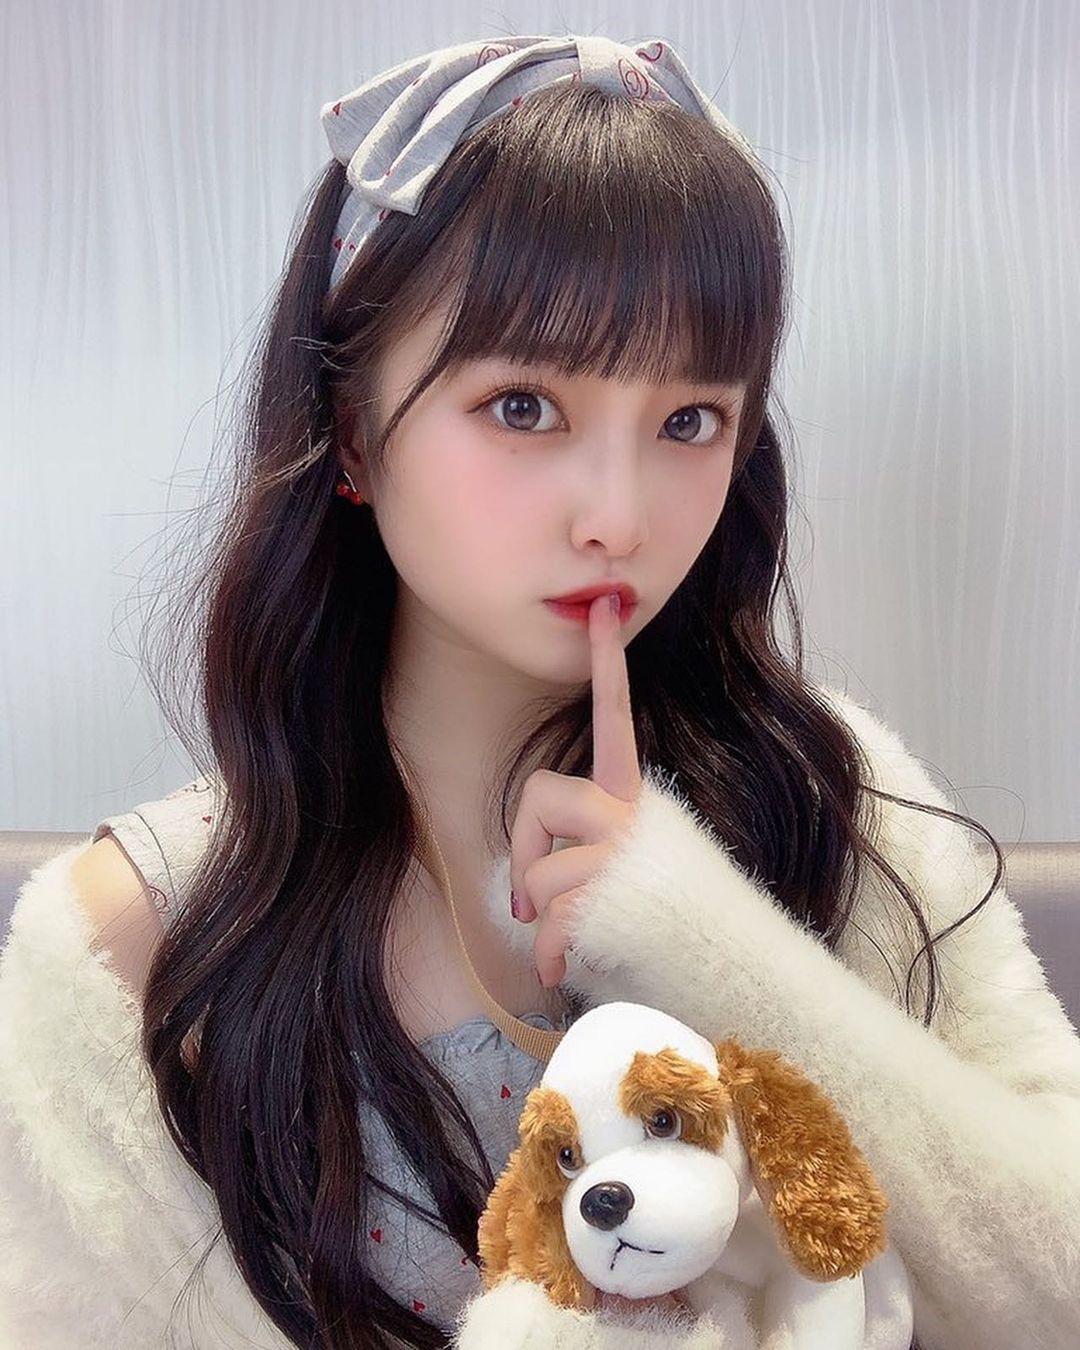 大眼美女@神城ののか 咬发圈撩马尾模样超可爱 网络美女 第2张